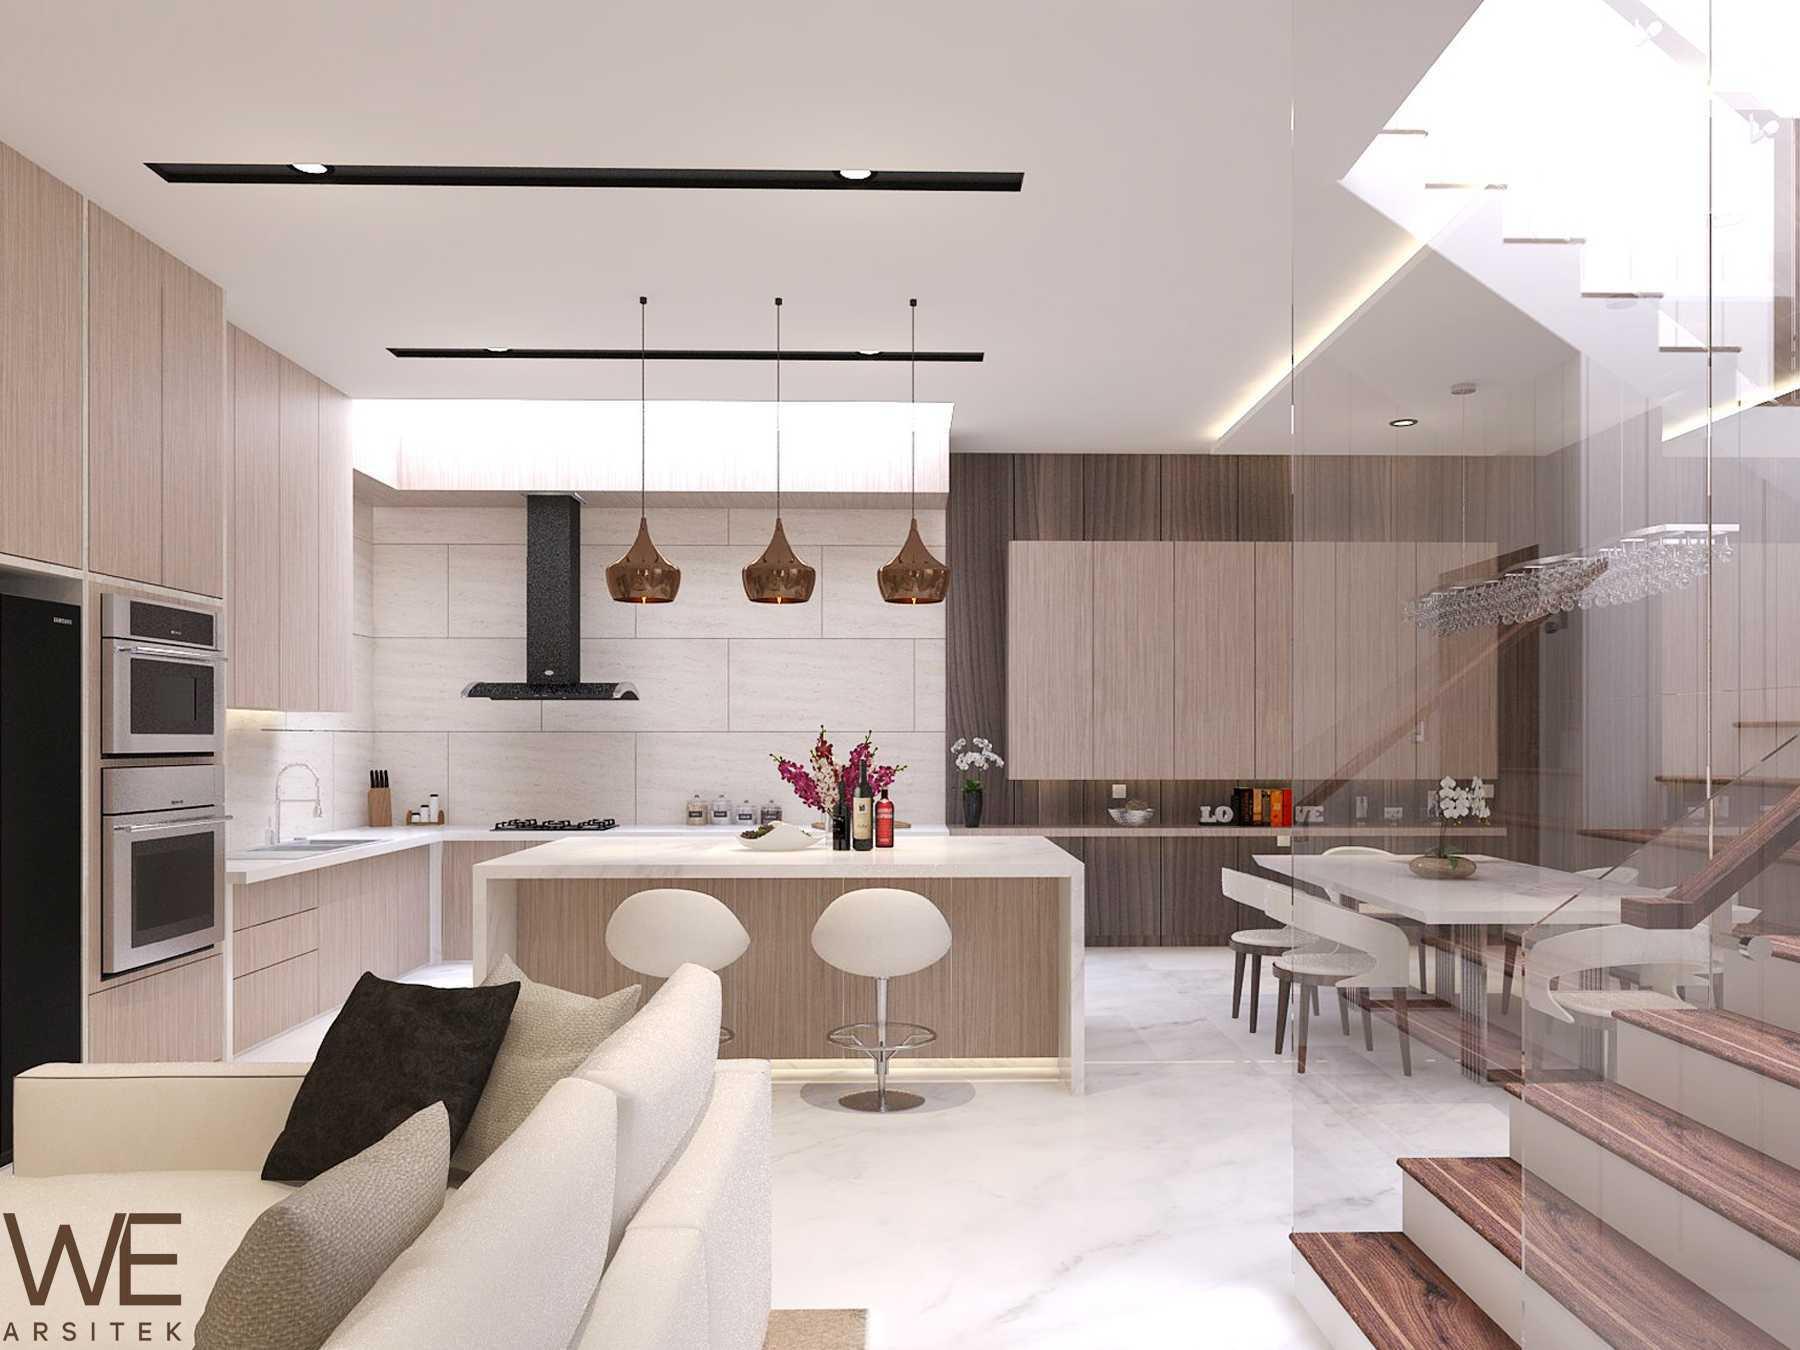 We Arsitek Li Residence - Contemporary Kota Medan, Sumatera Utara, Indonesia Kota Medan, Sumatera Utara, Indonesia Dapur   45716